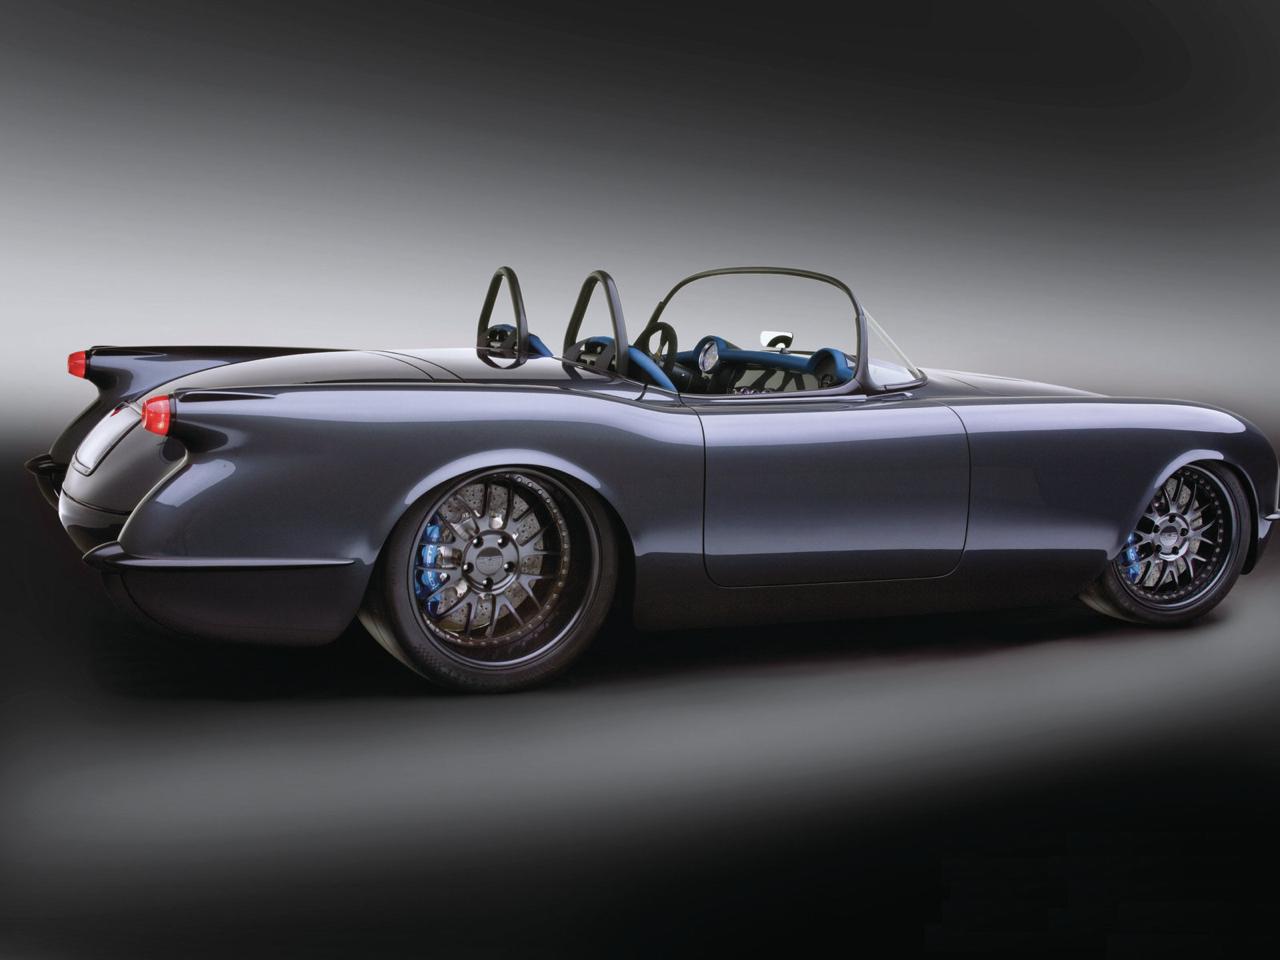 '54 Corvette ZR1... 1954 ?! 24